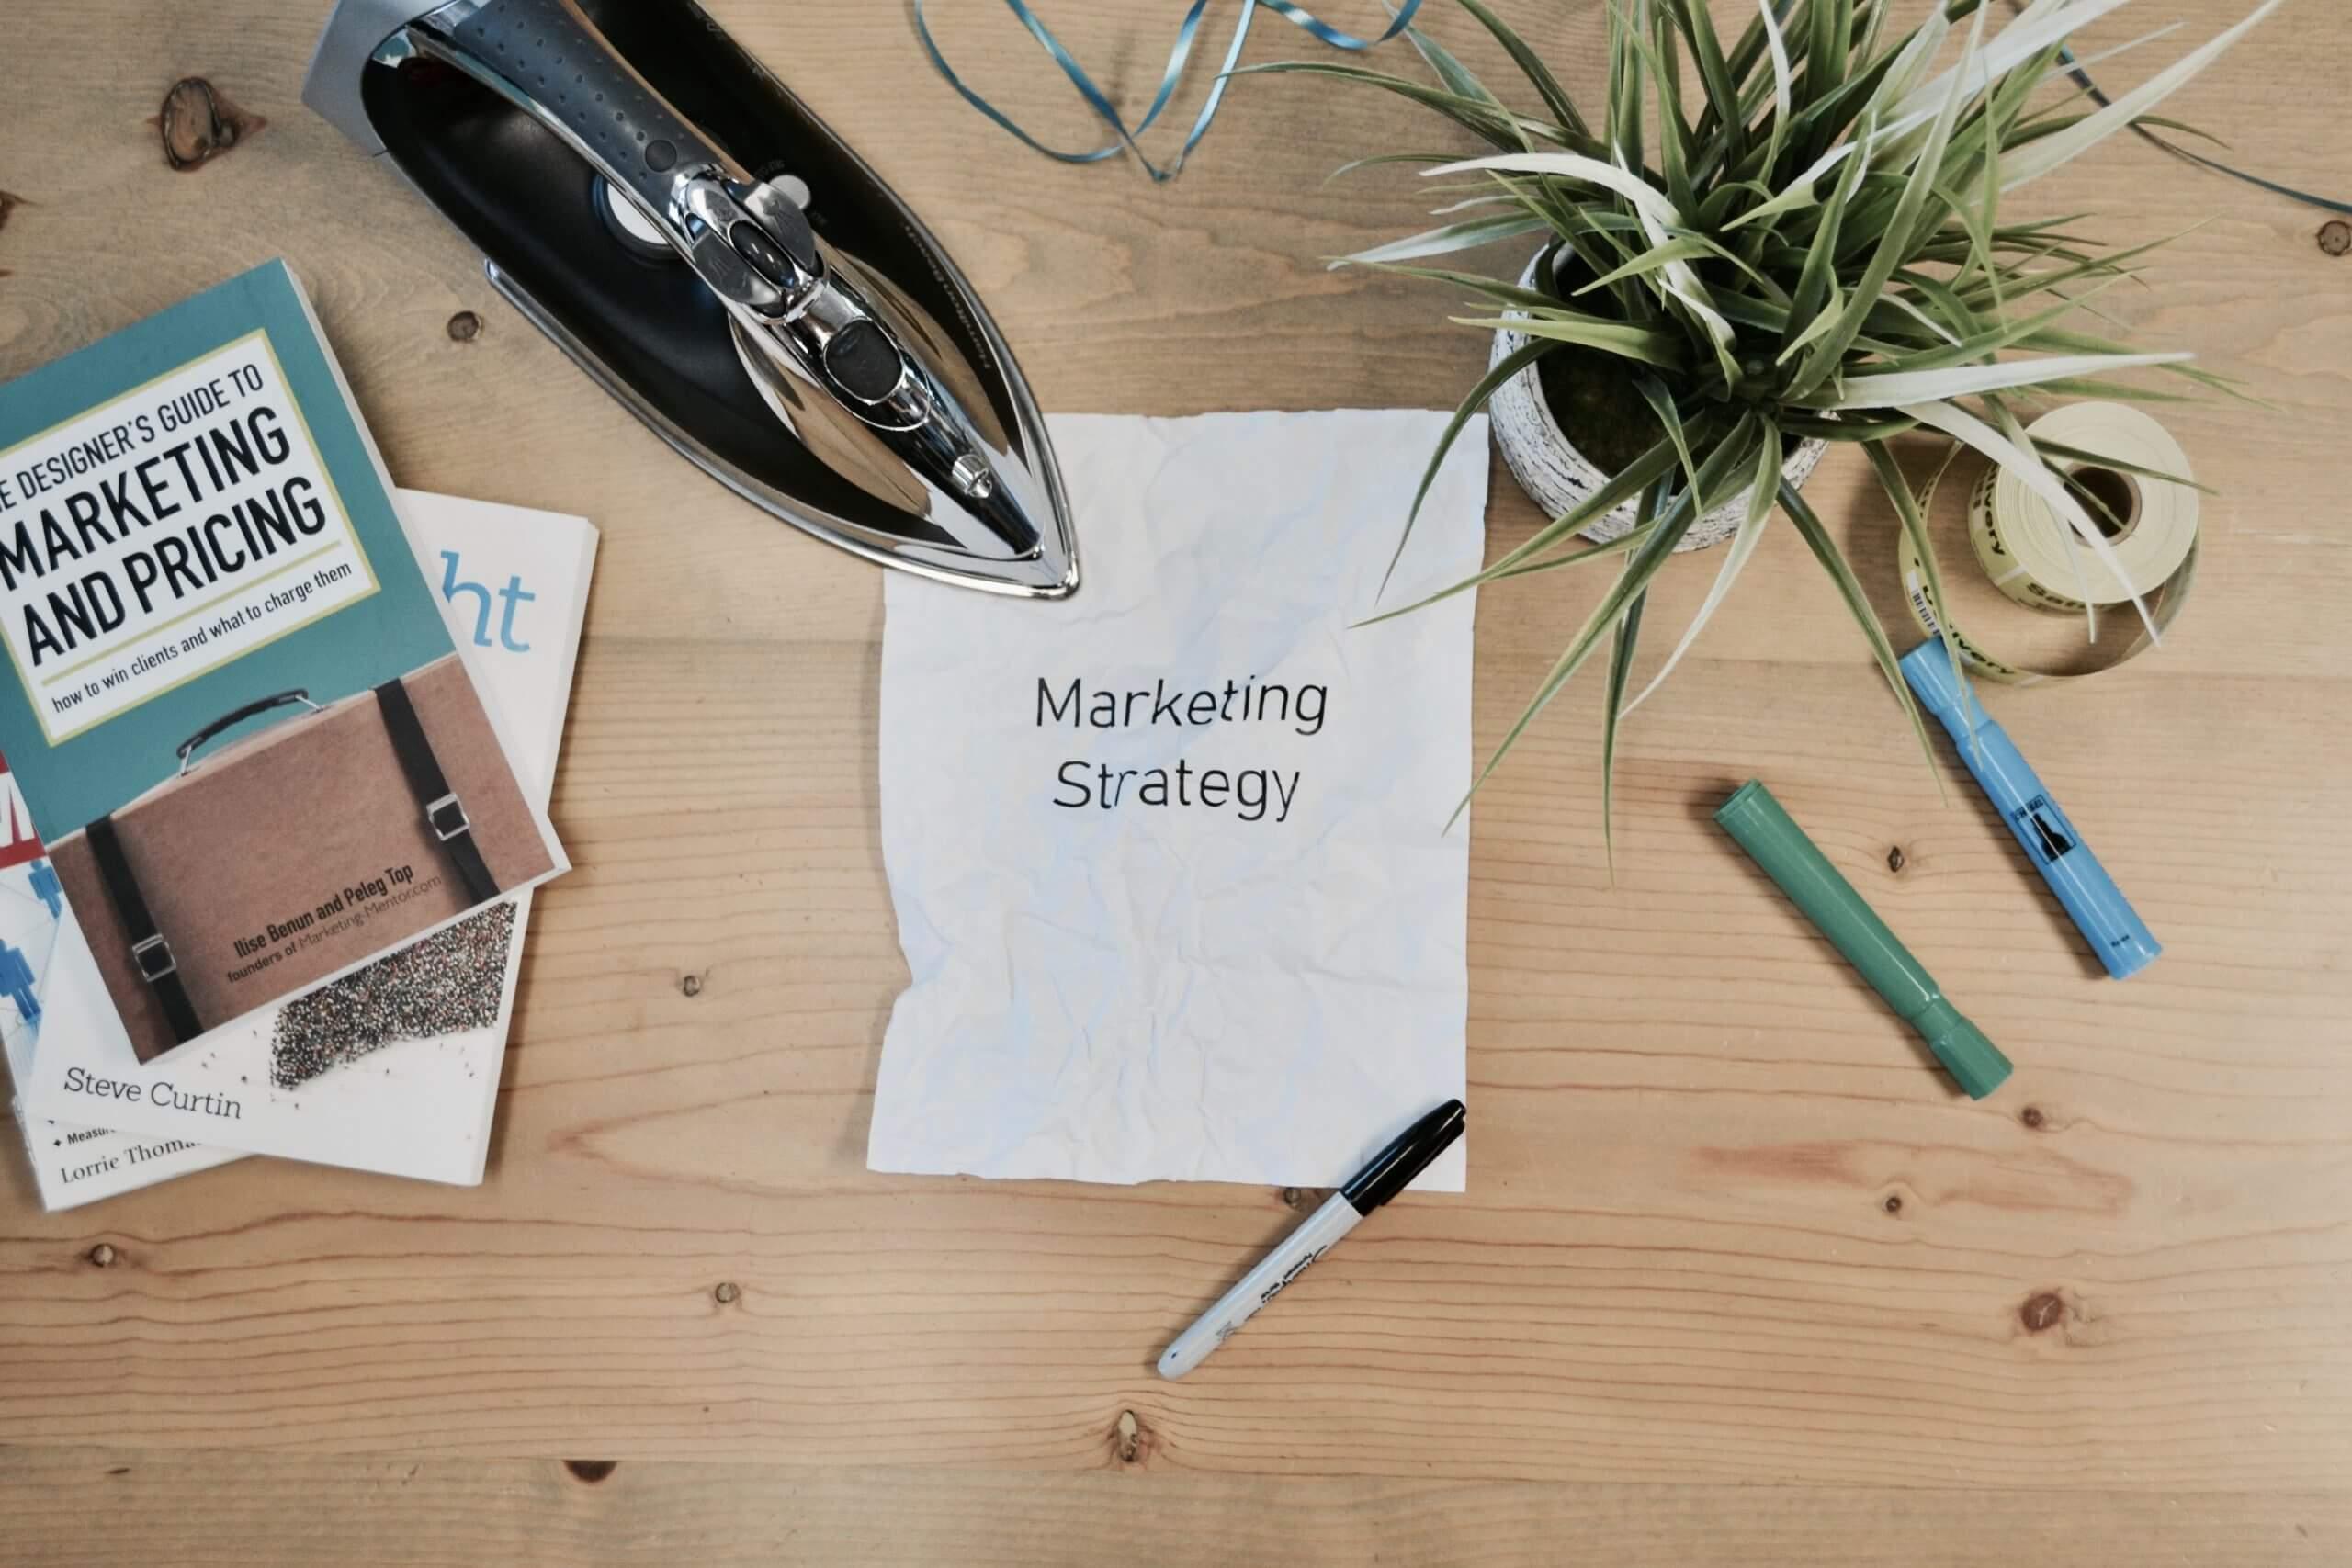 Importance of data analytics in marketing